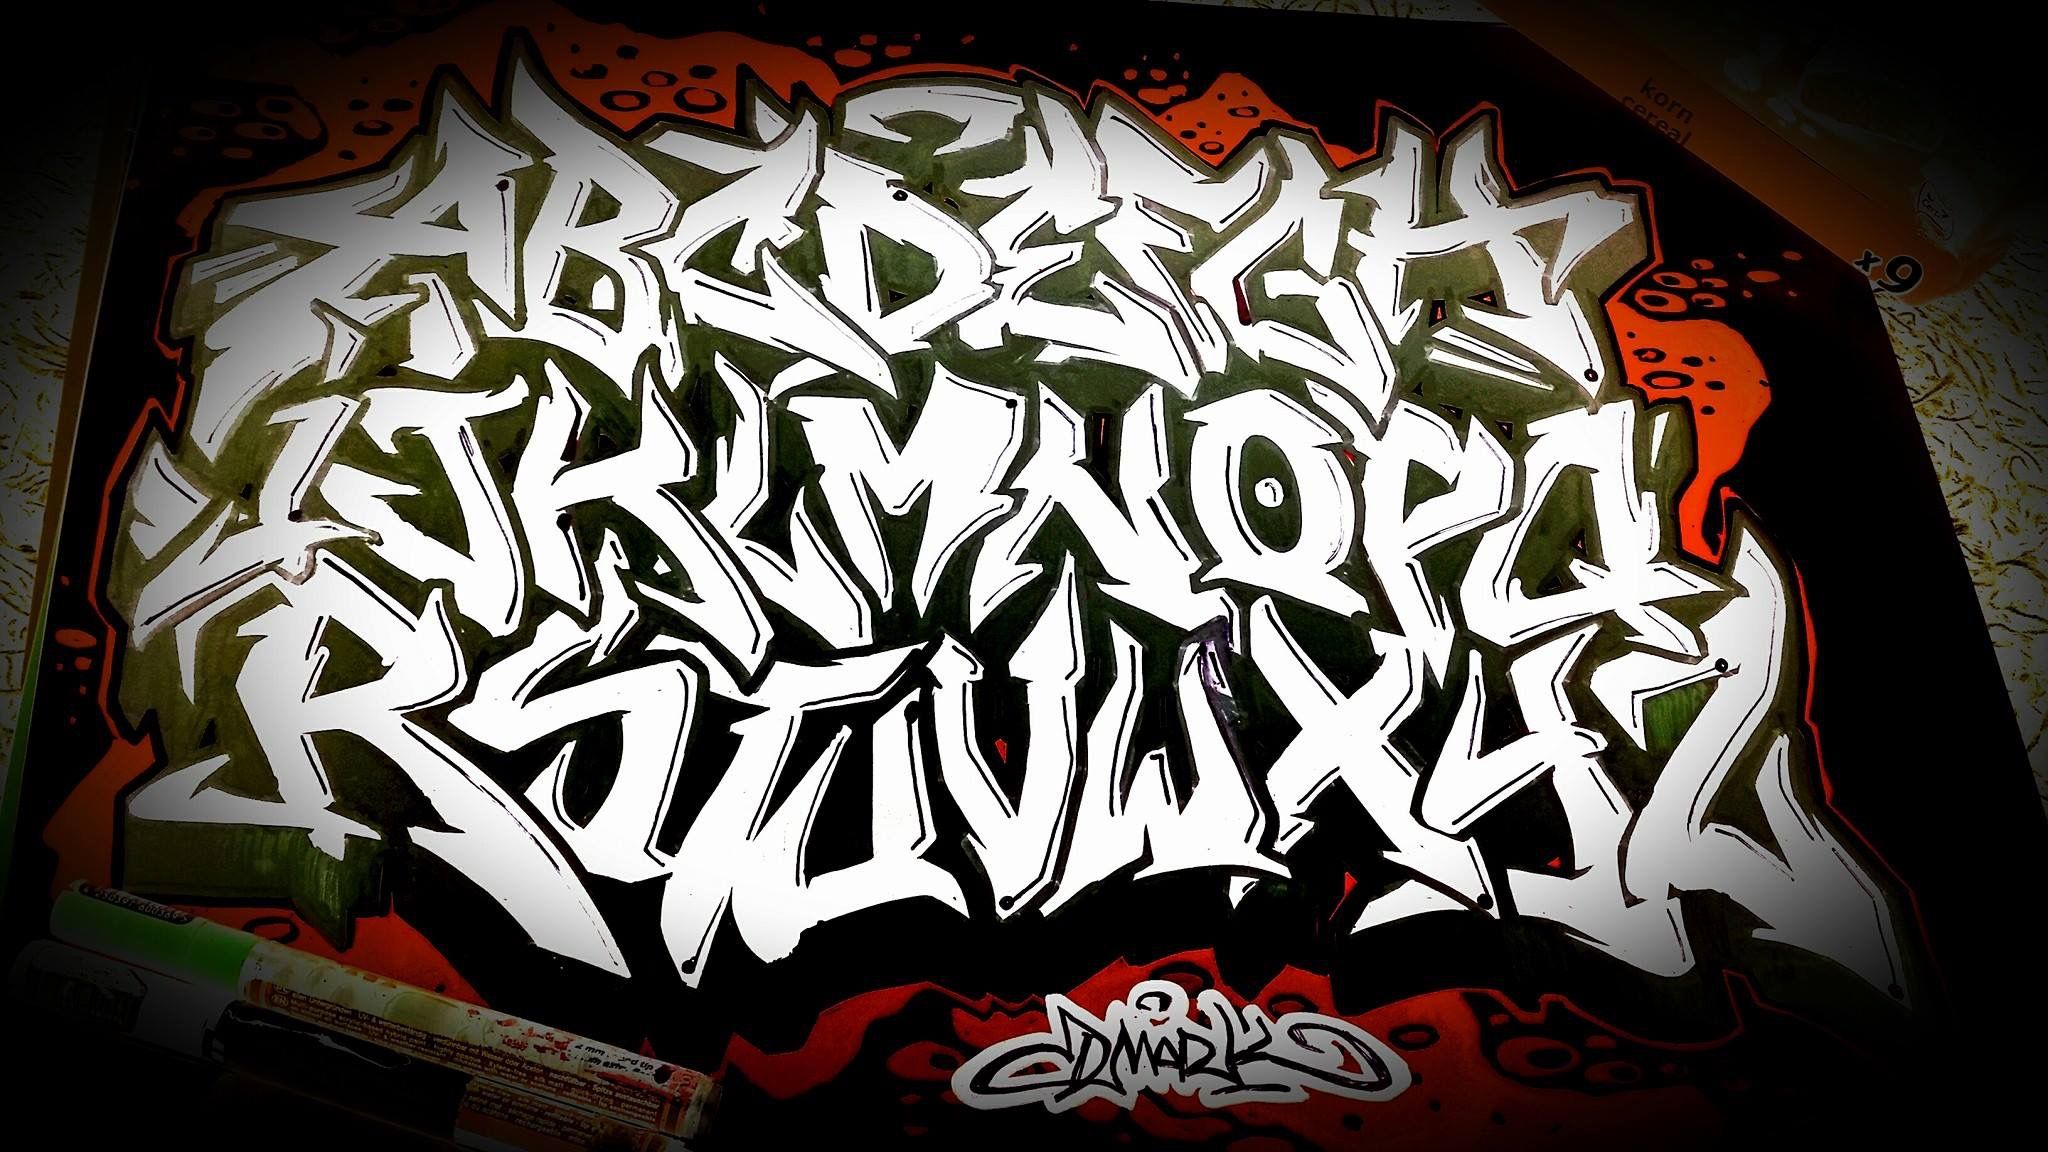 The Dmark Dice Simple Que Que Opinas Si Te Las Avientas Graffiti